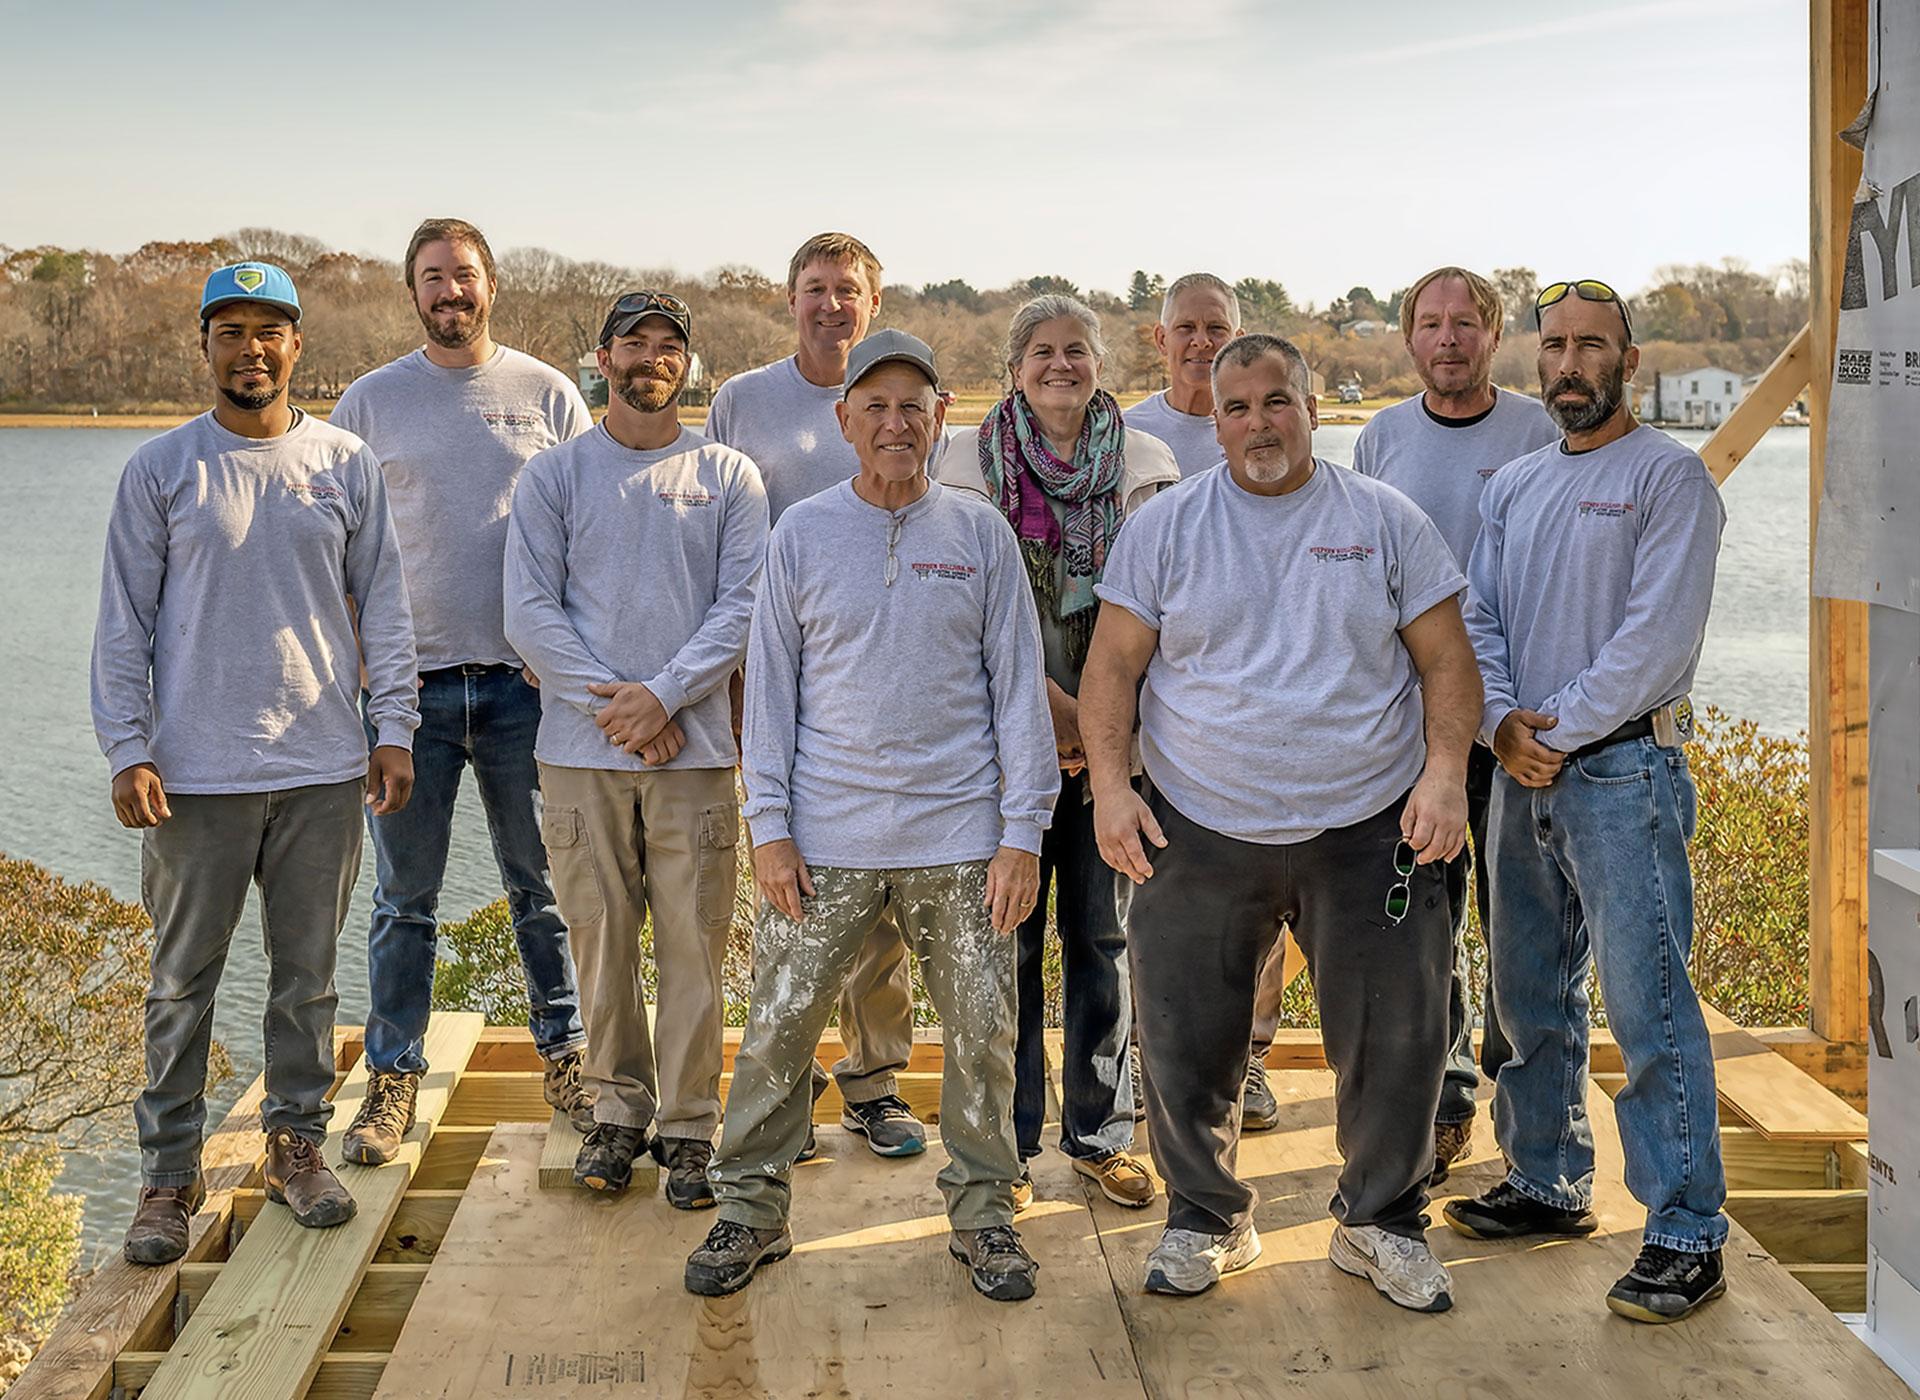 About - Stephen-Sullivan-Custom-Home-Builders-Rhode-Island-Team-Photo